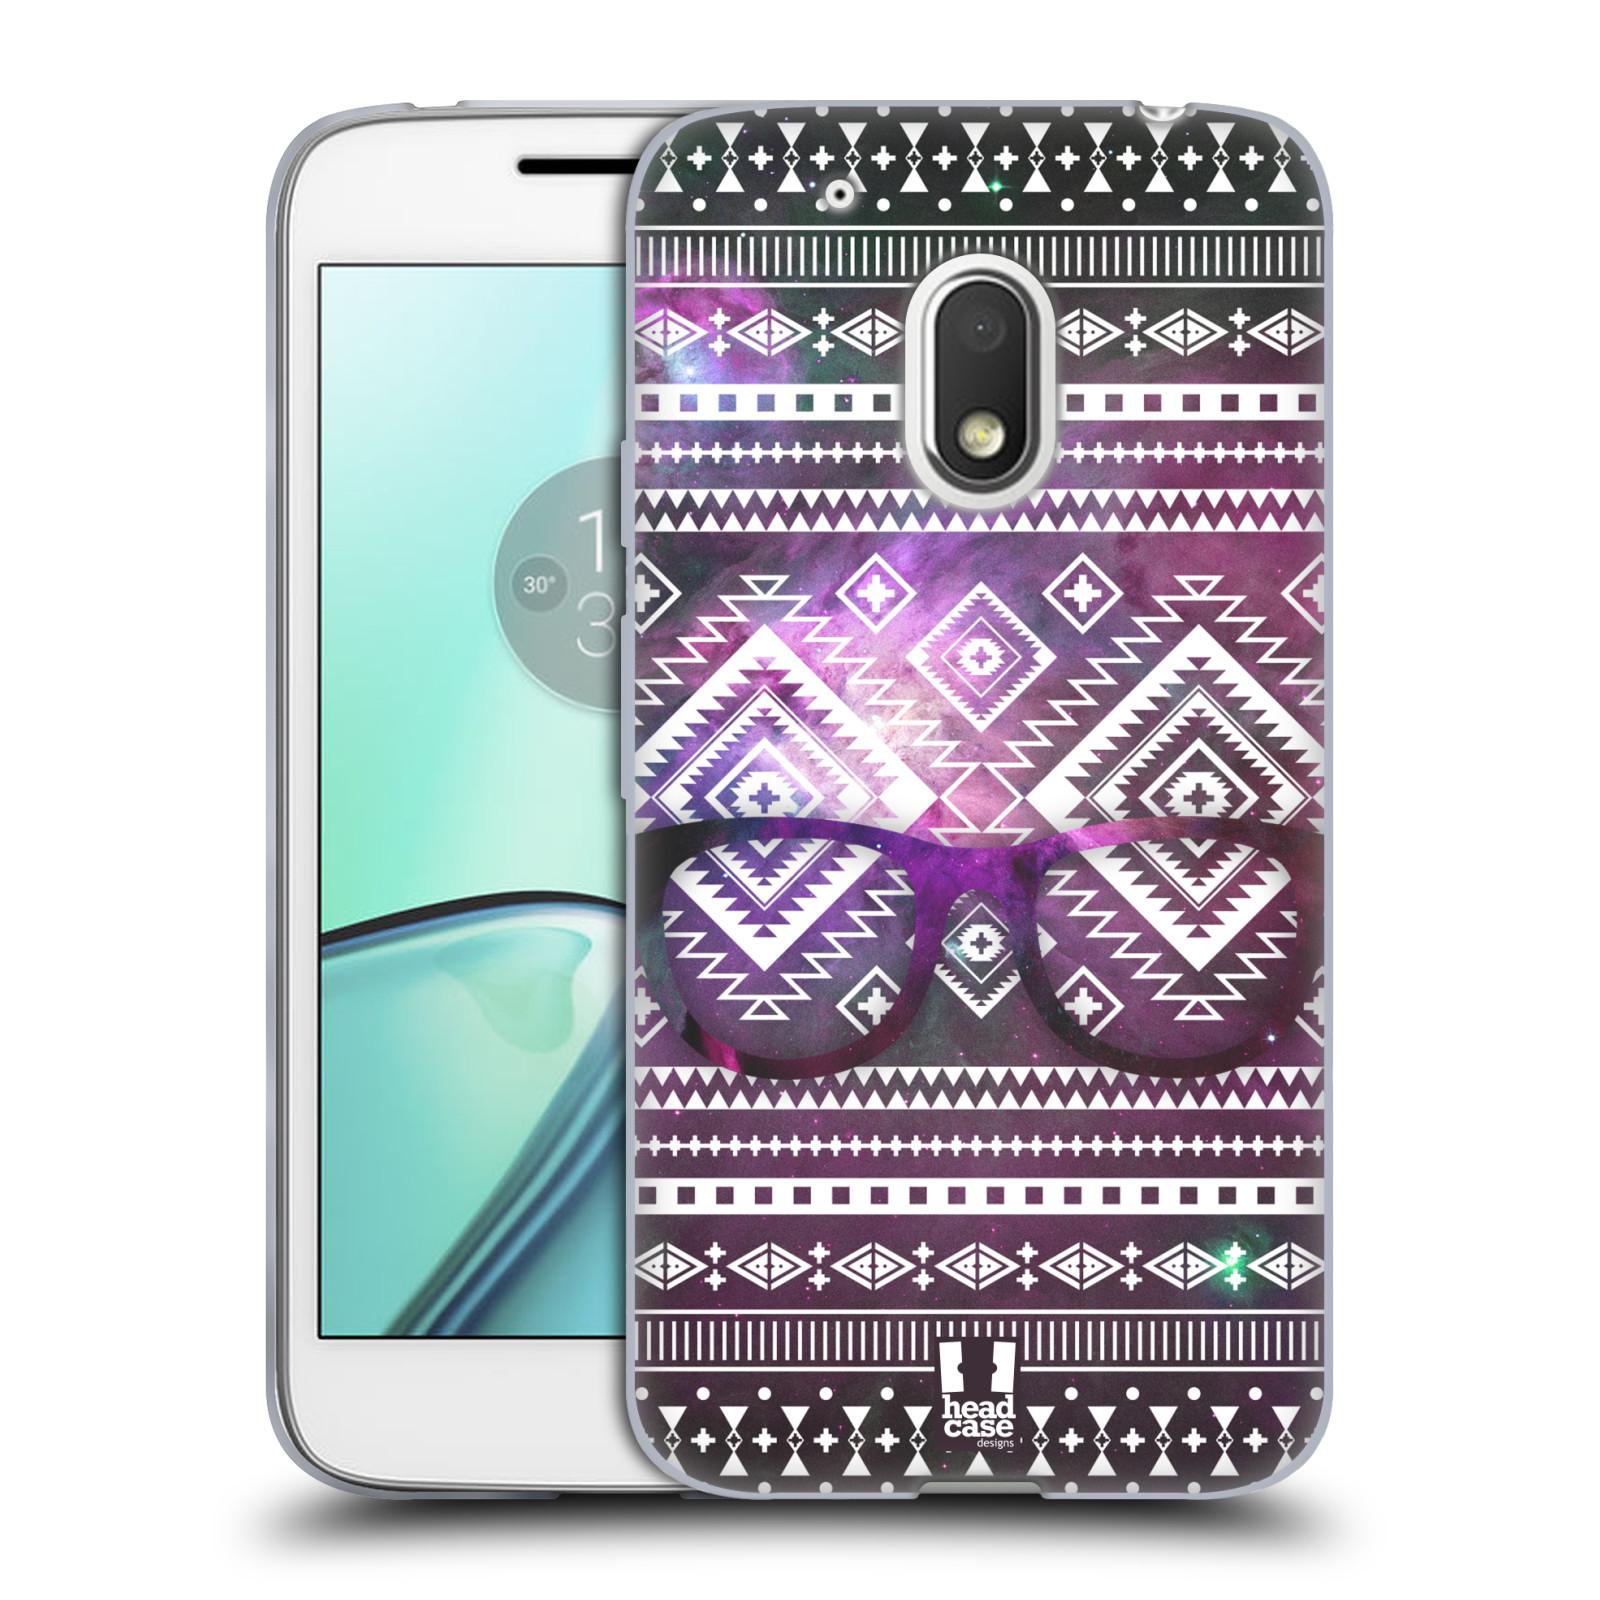 Silikonové pouzdro na mobil Lenovo Moto G4 Play - Head Case - NEBULA BRÝLE (Silikonový kryt či obal na mobilní telefon (Motorola) Moto G4 Play)